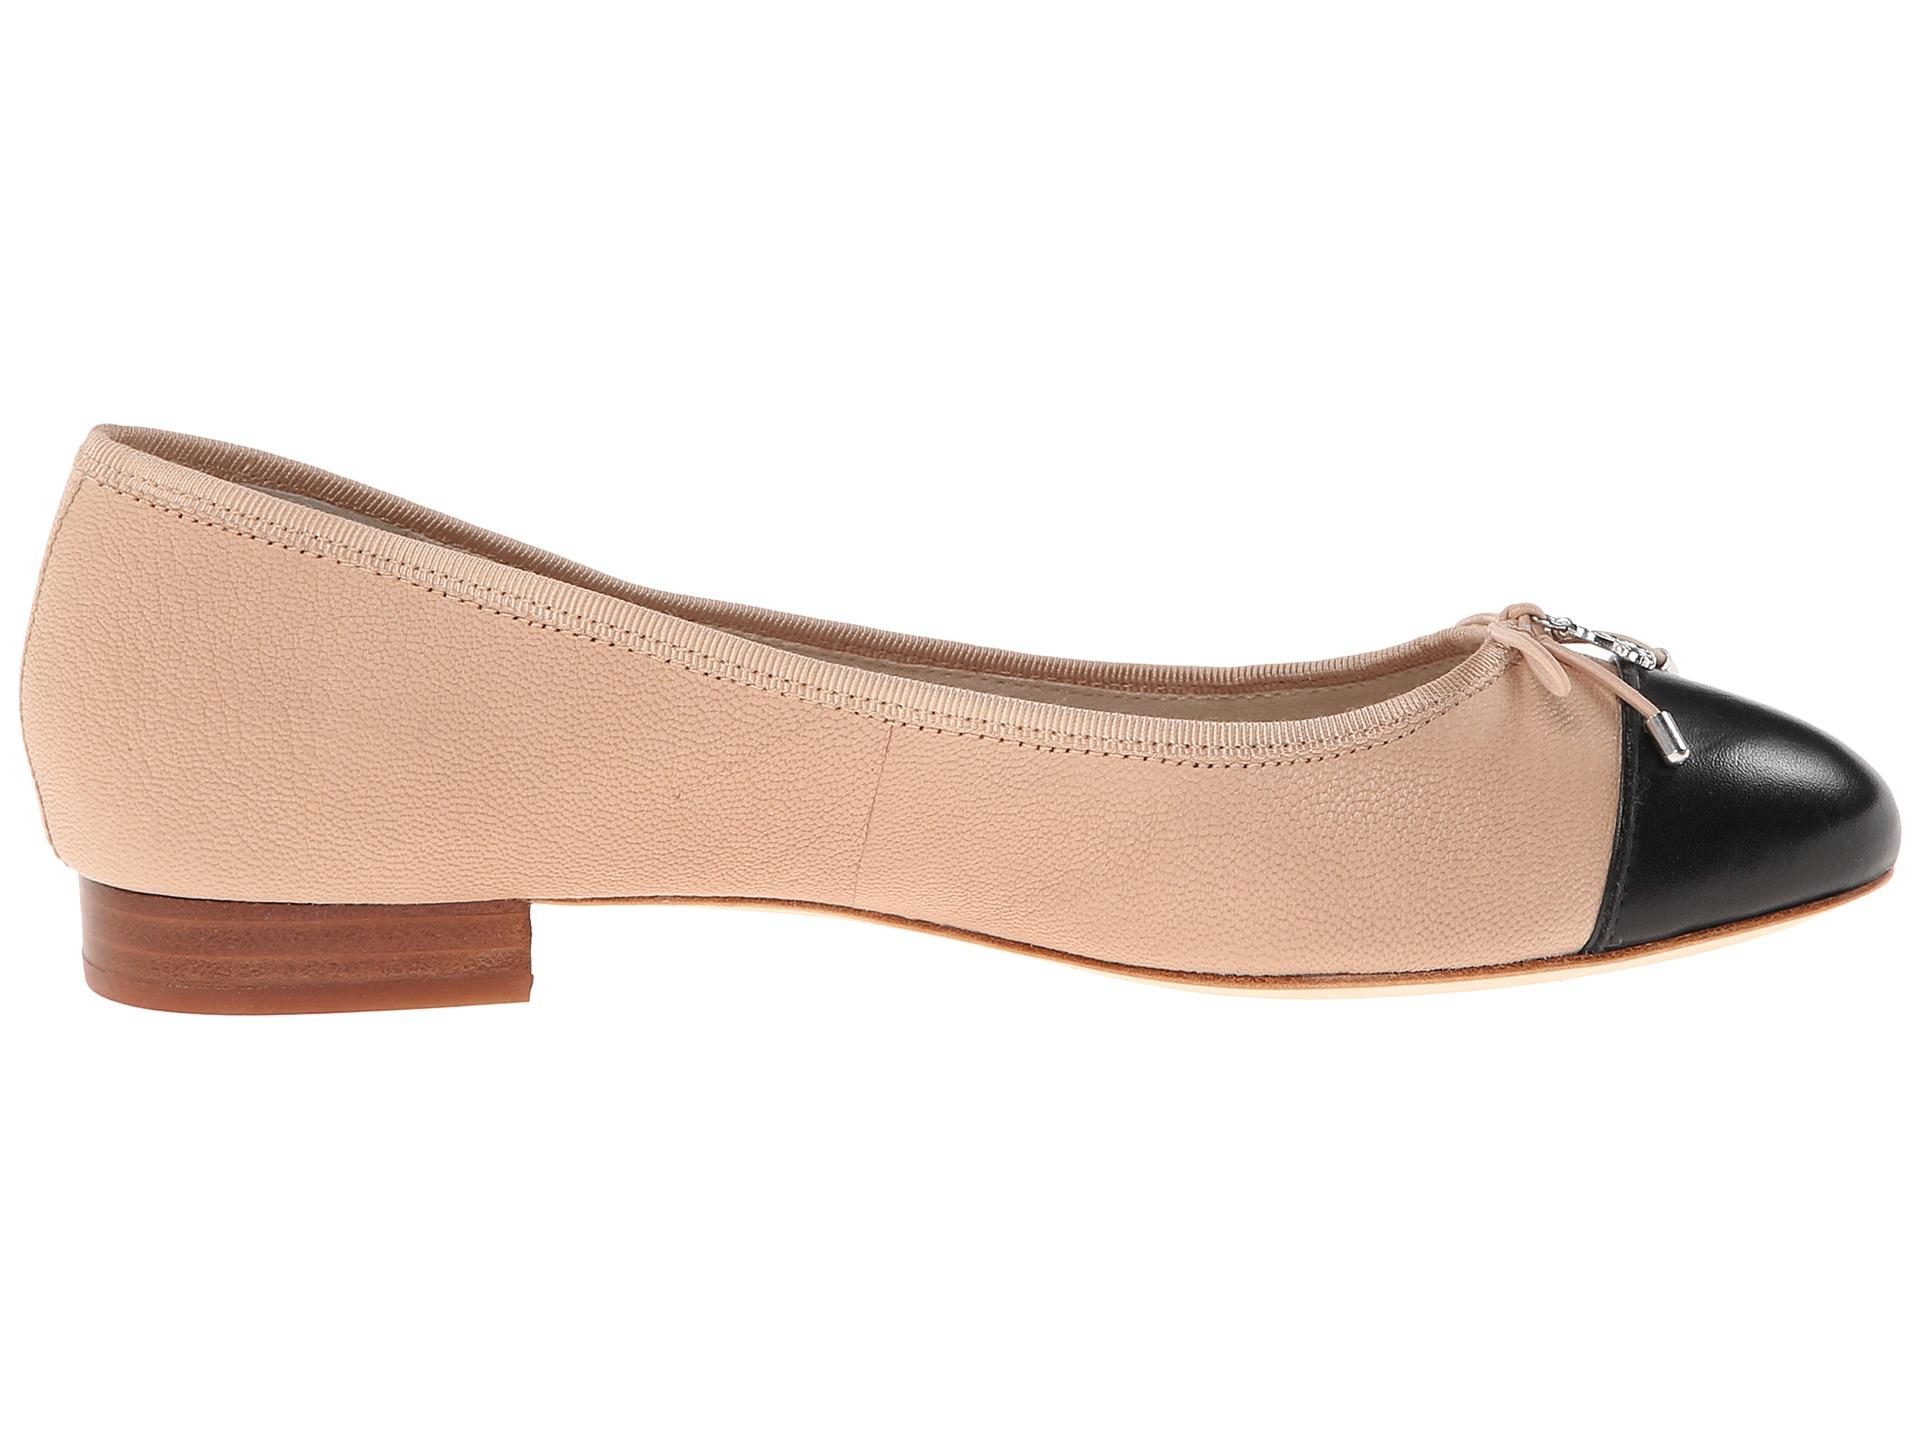 Womens Shoes Sam Edelman Bev Blush/Black Leather